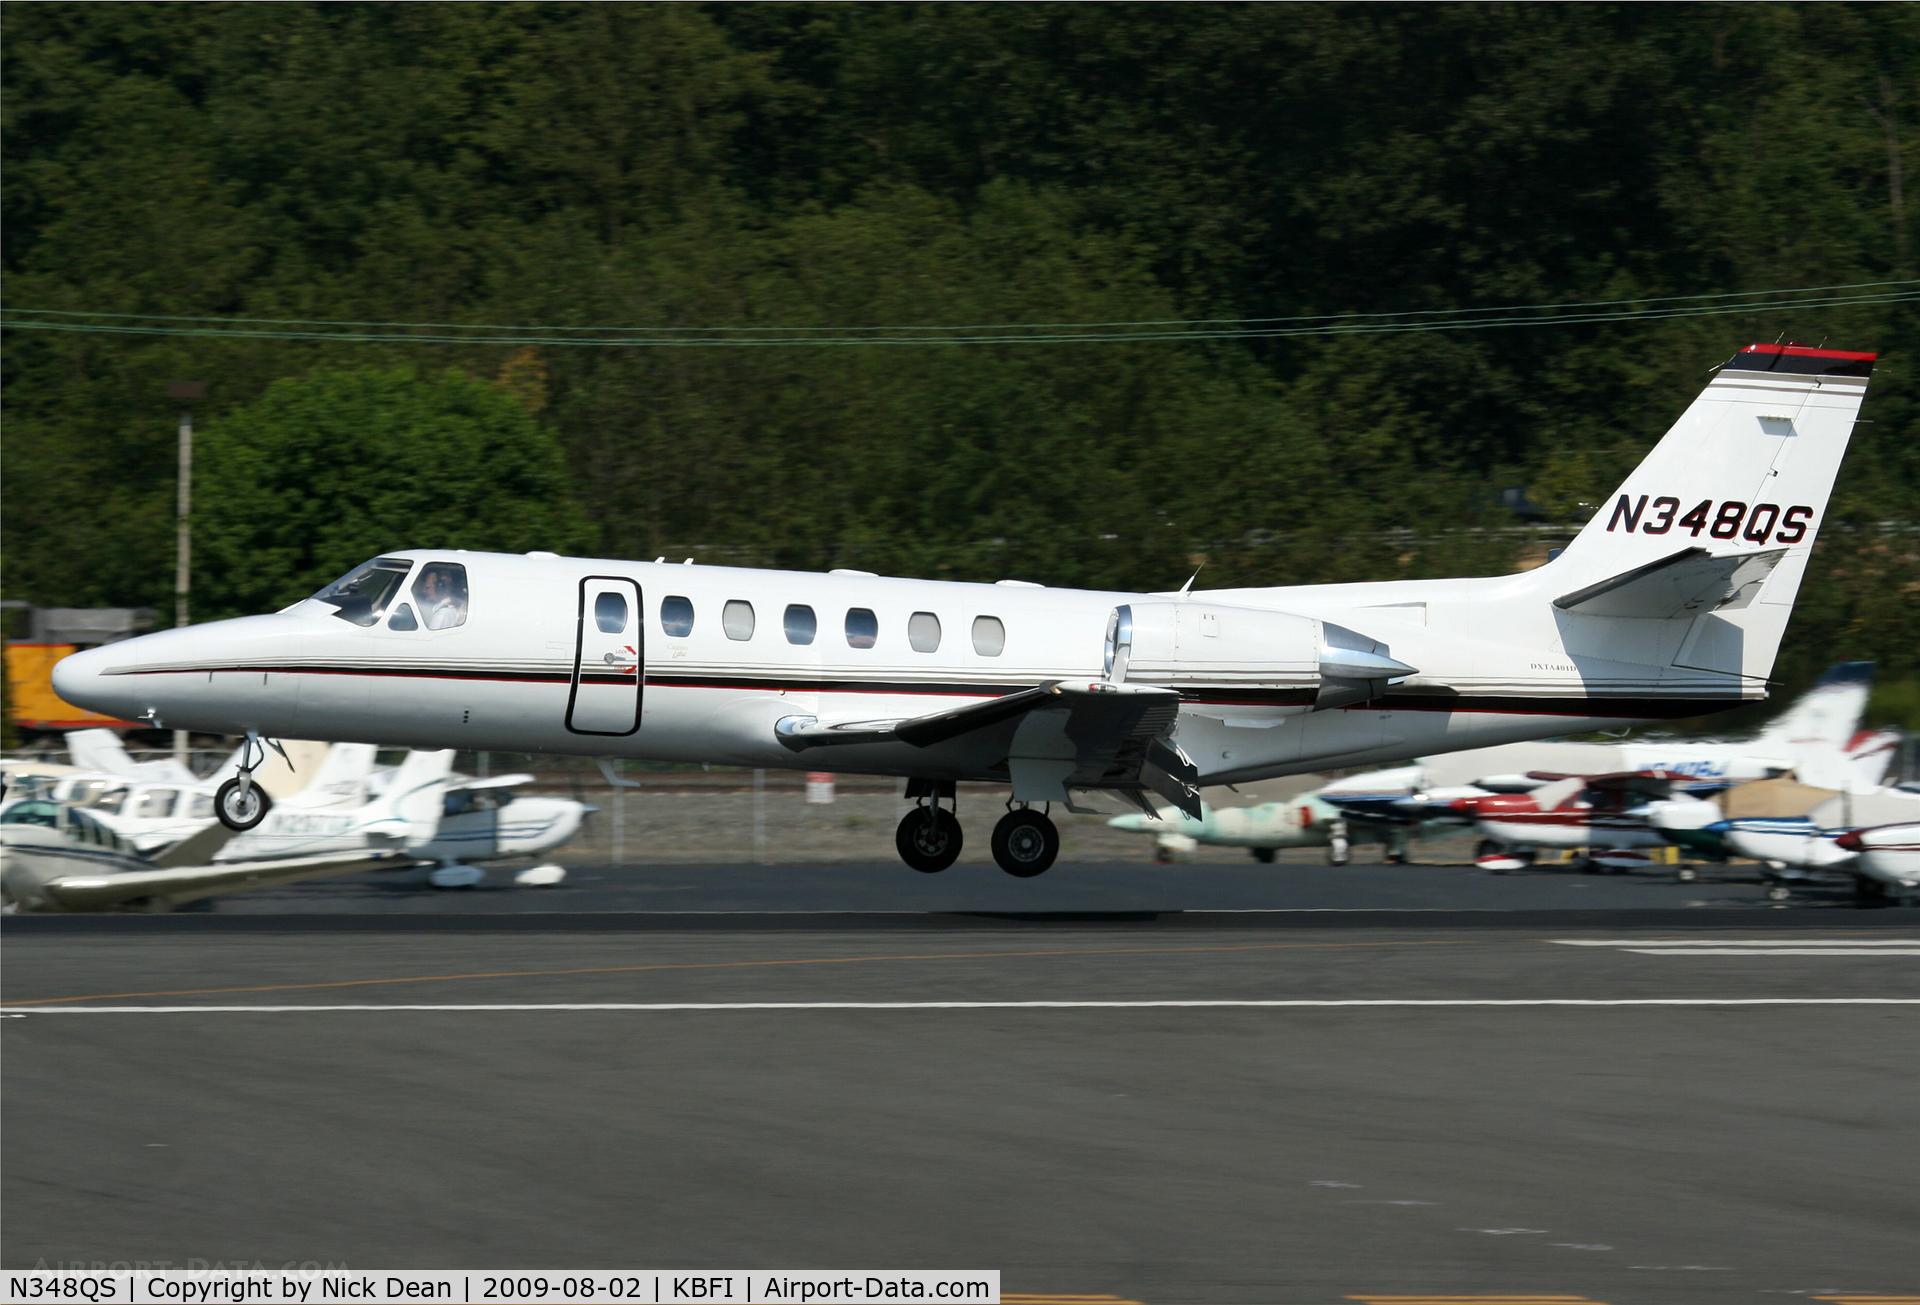 N348QS, 1996 Cessna 560 Citation Ultra C/N 560-0348, KBFI